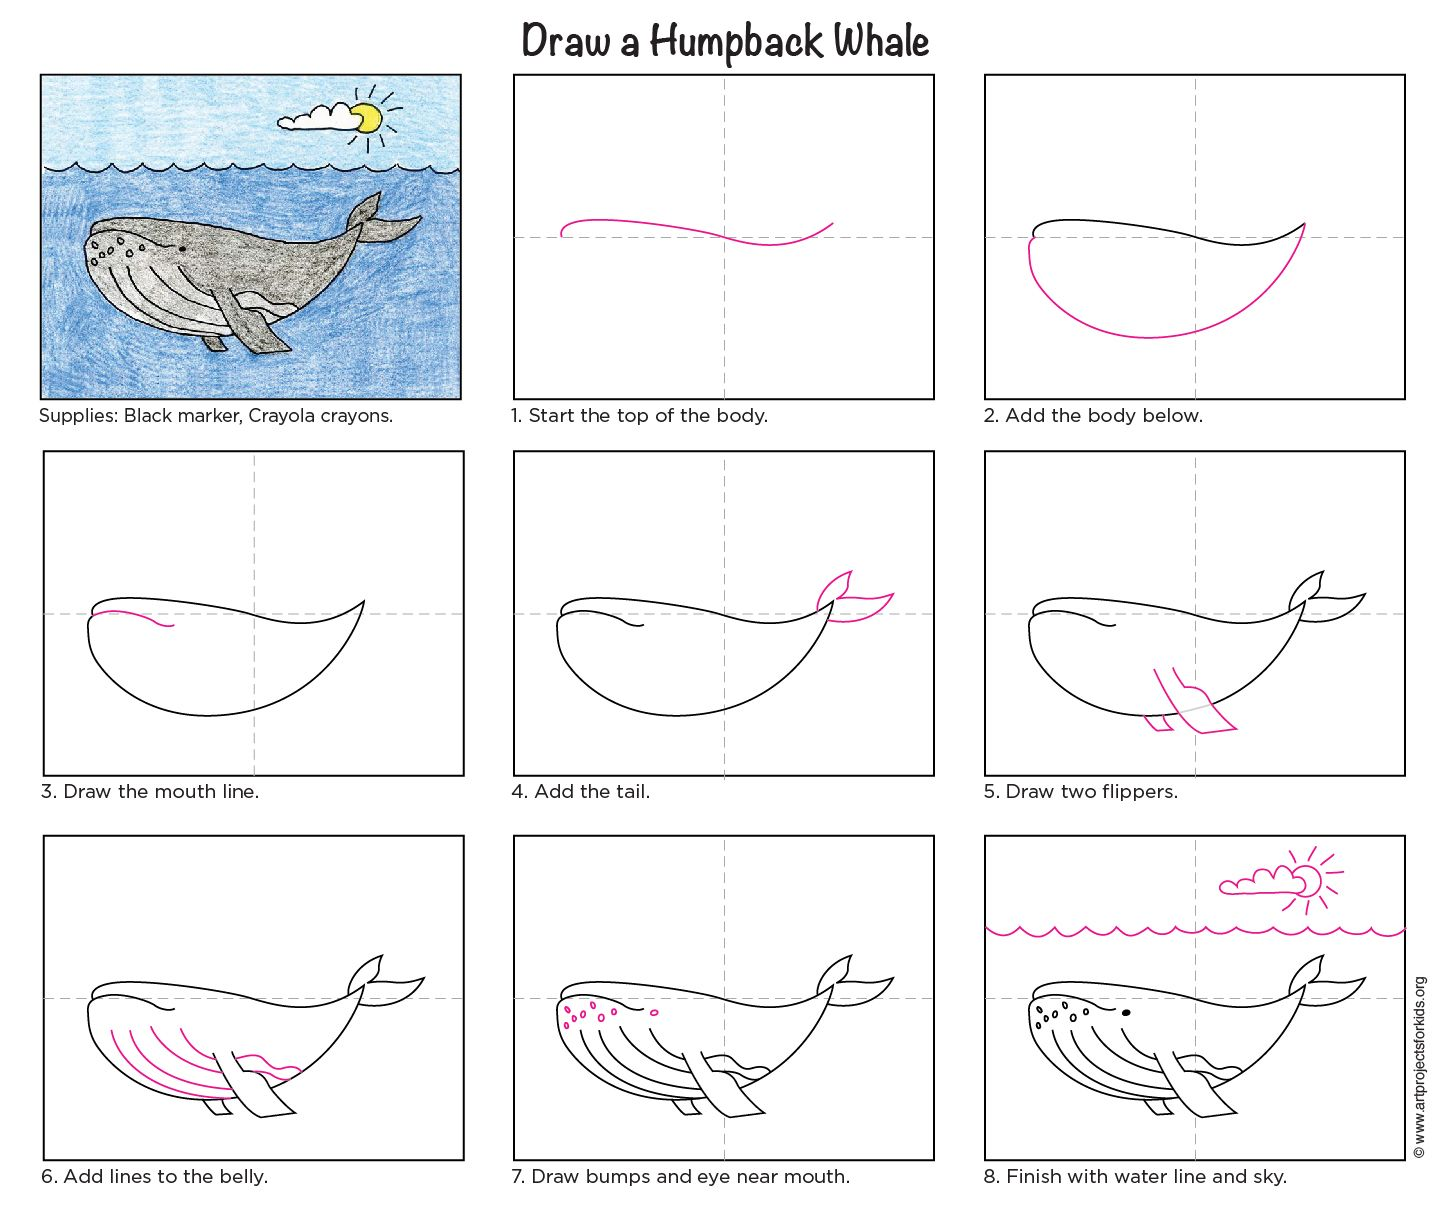 Draw A Humpback Whale